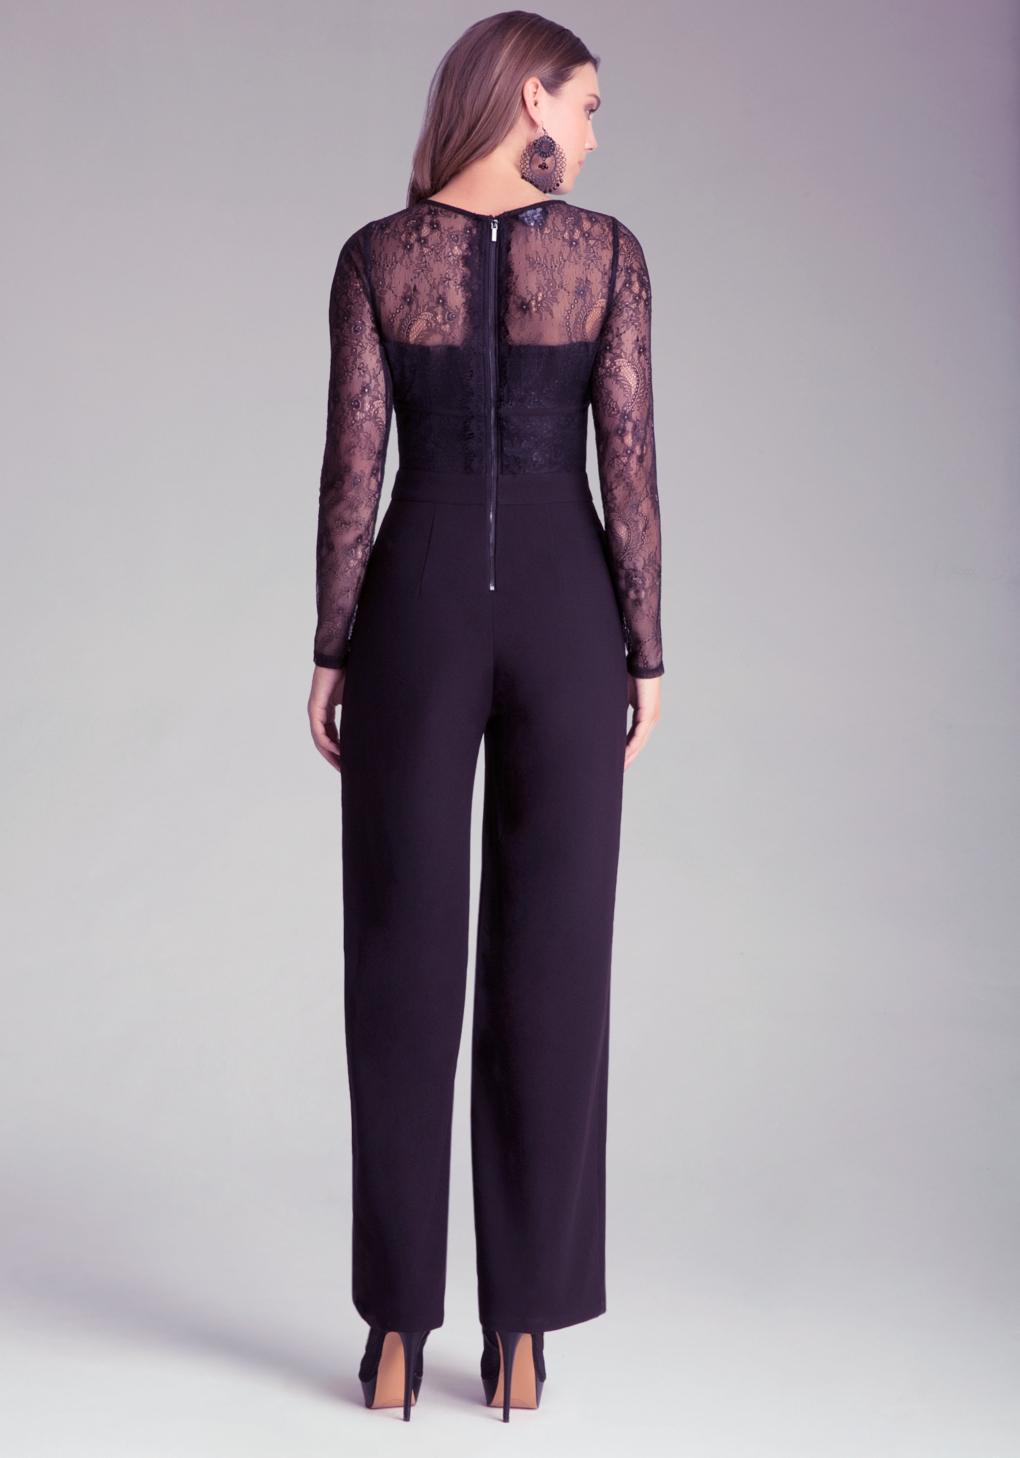 lyst bebe petite lace jumpsuit in black. Black Bedroom Furniture Sets. Home Design Ideas